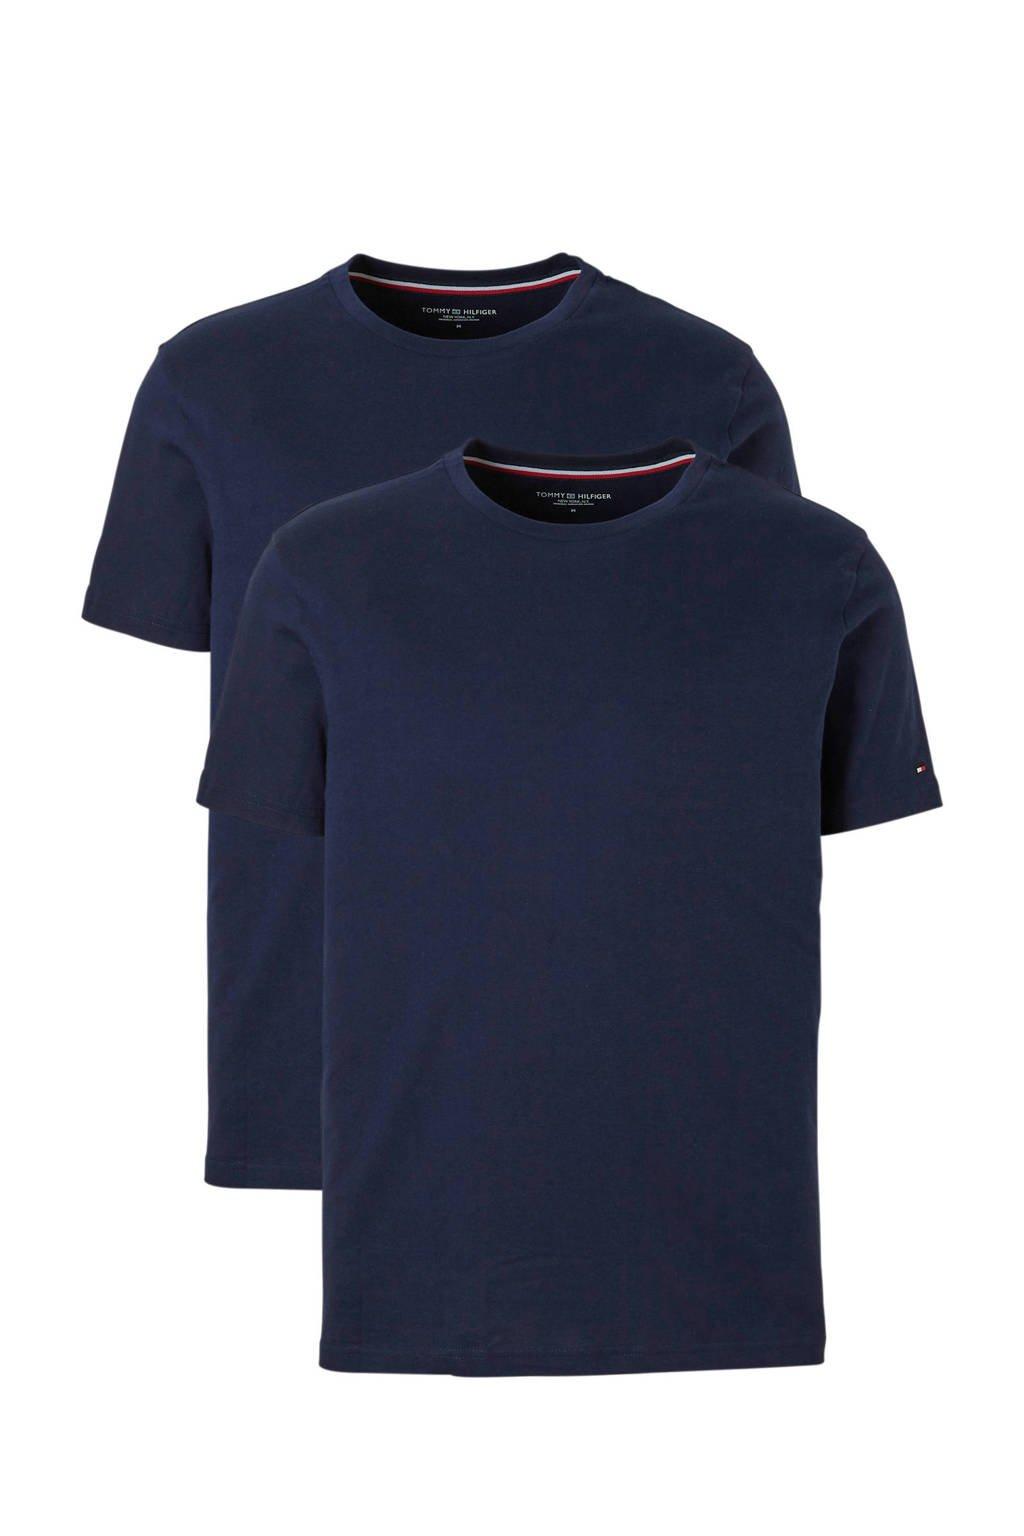 Tommy Hilfiger T-shirt (set van 2), Donker blauw